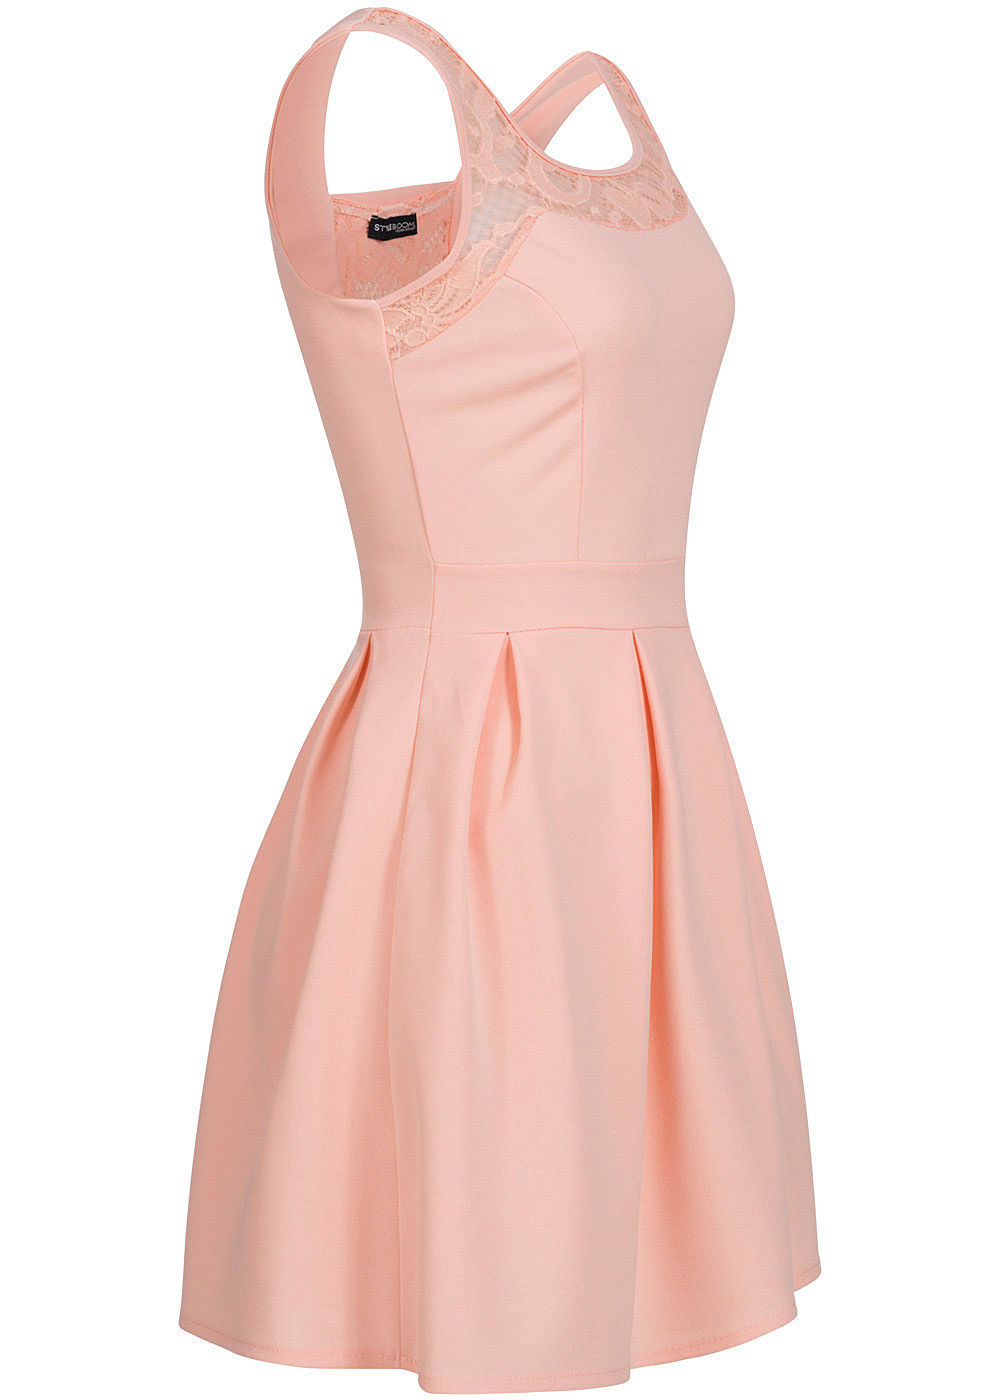 styleboom fashion damen mini kleid spitze rosa 77onlineshop. Black Bedroom Furniture Sets. Home Design Ideas